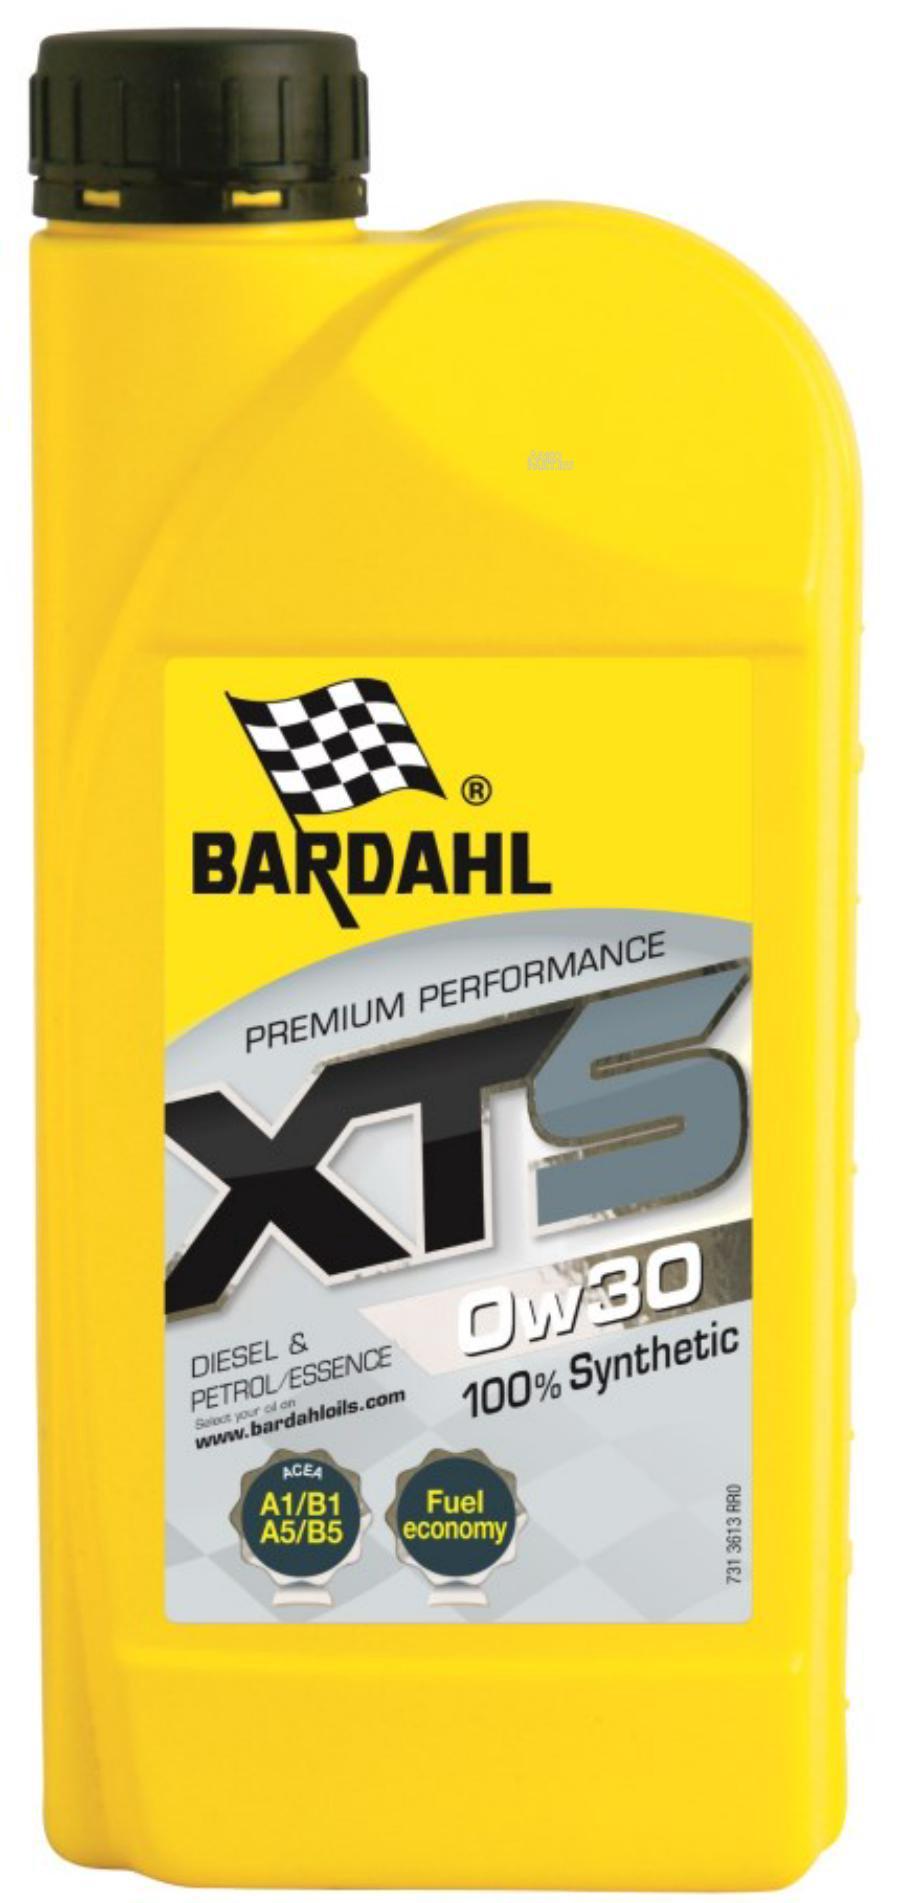 0W30 XTS A1/B1 A5/B5 1L (синт. моторное масло)